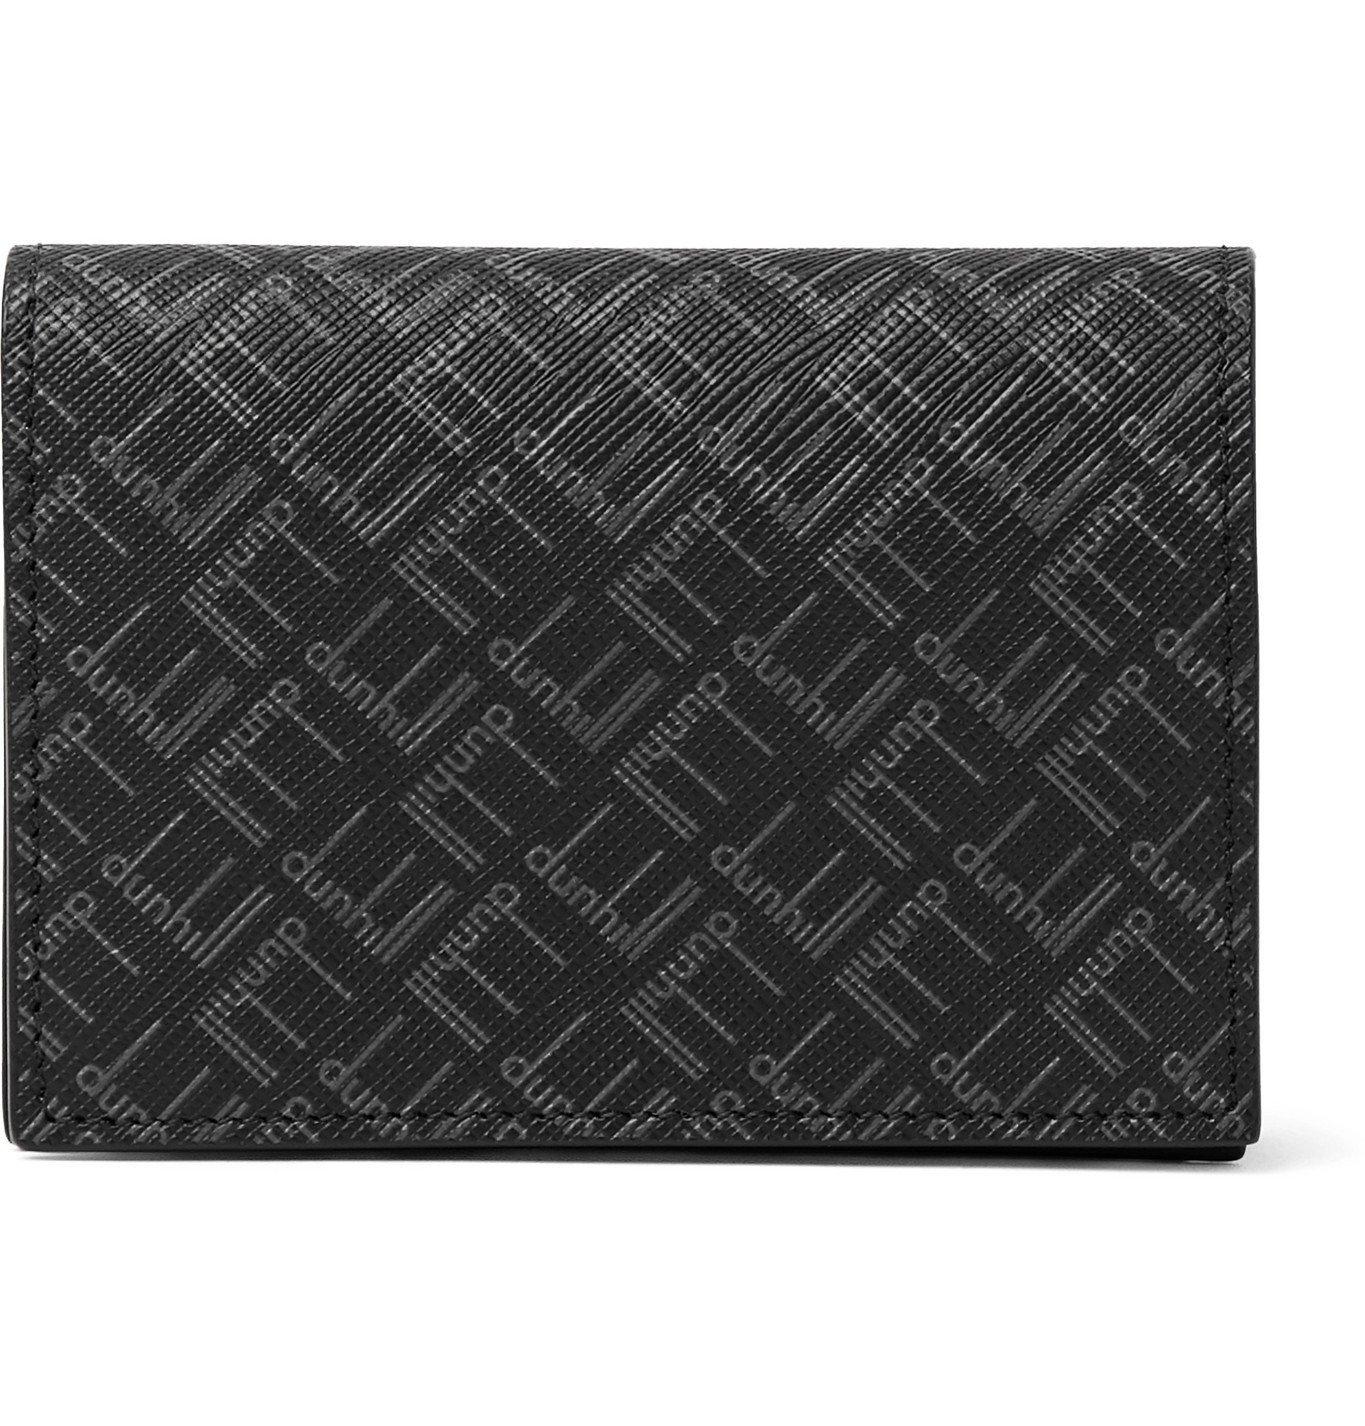 Dunhill - Logo-Print Coated-Canvas Bifold Cardholder - Black